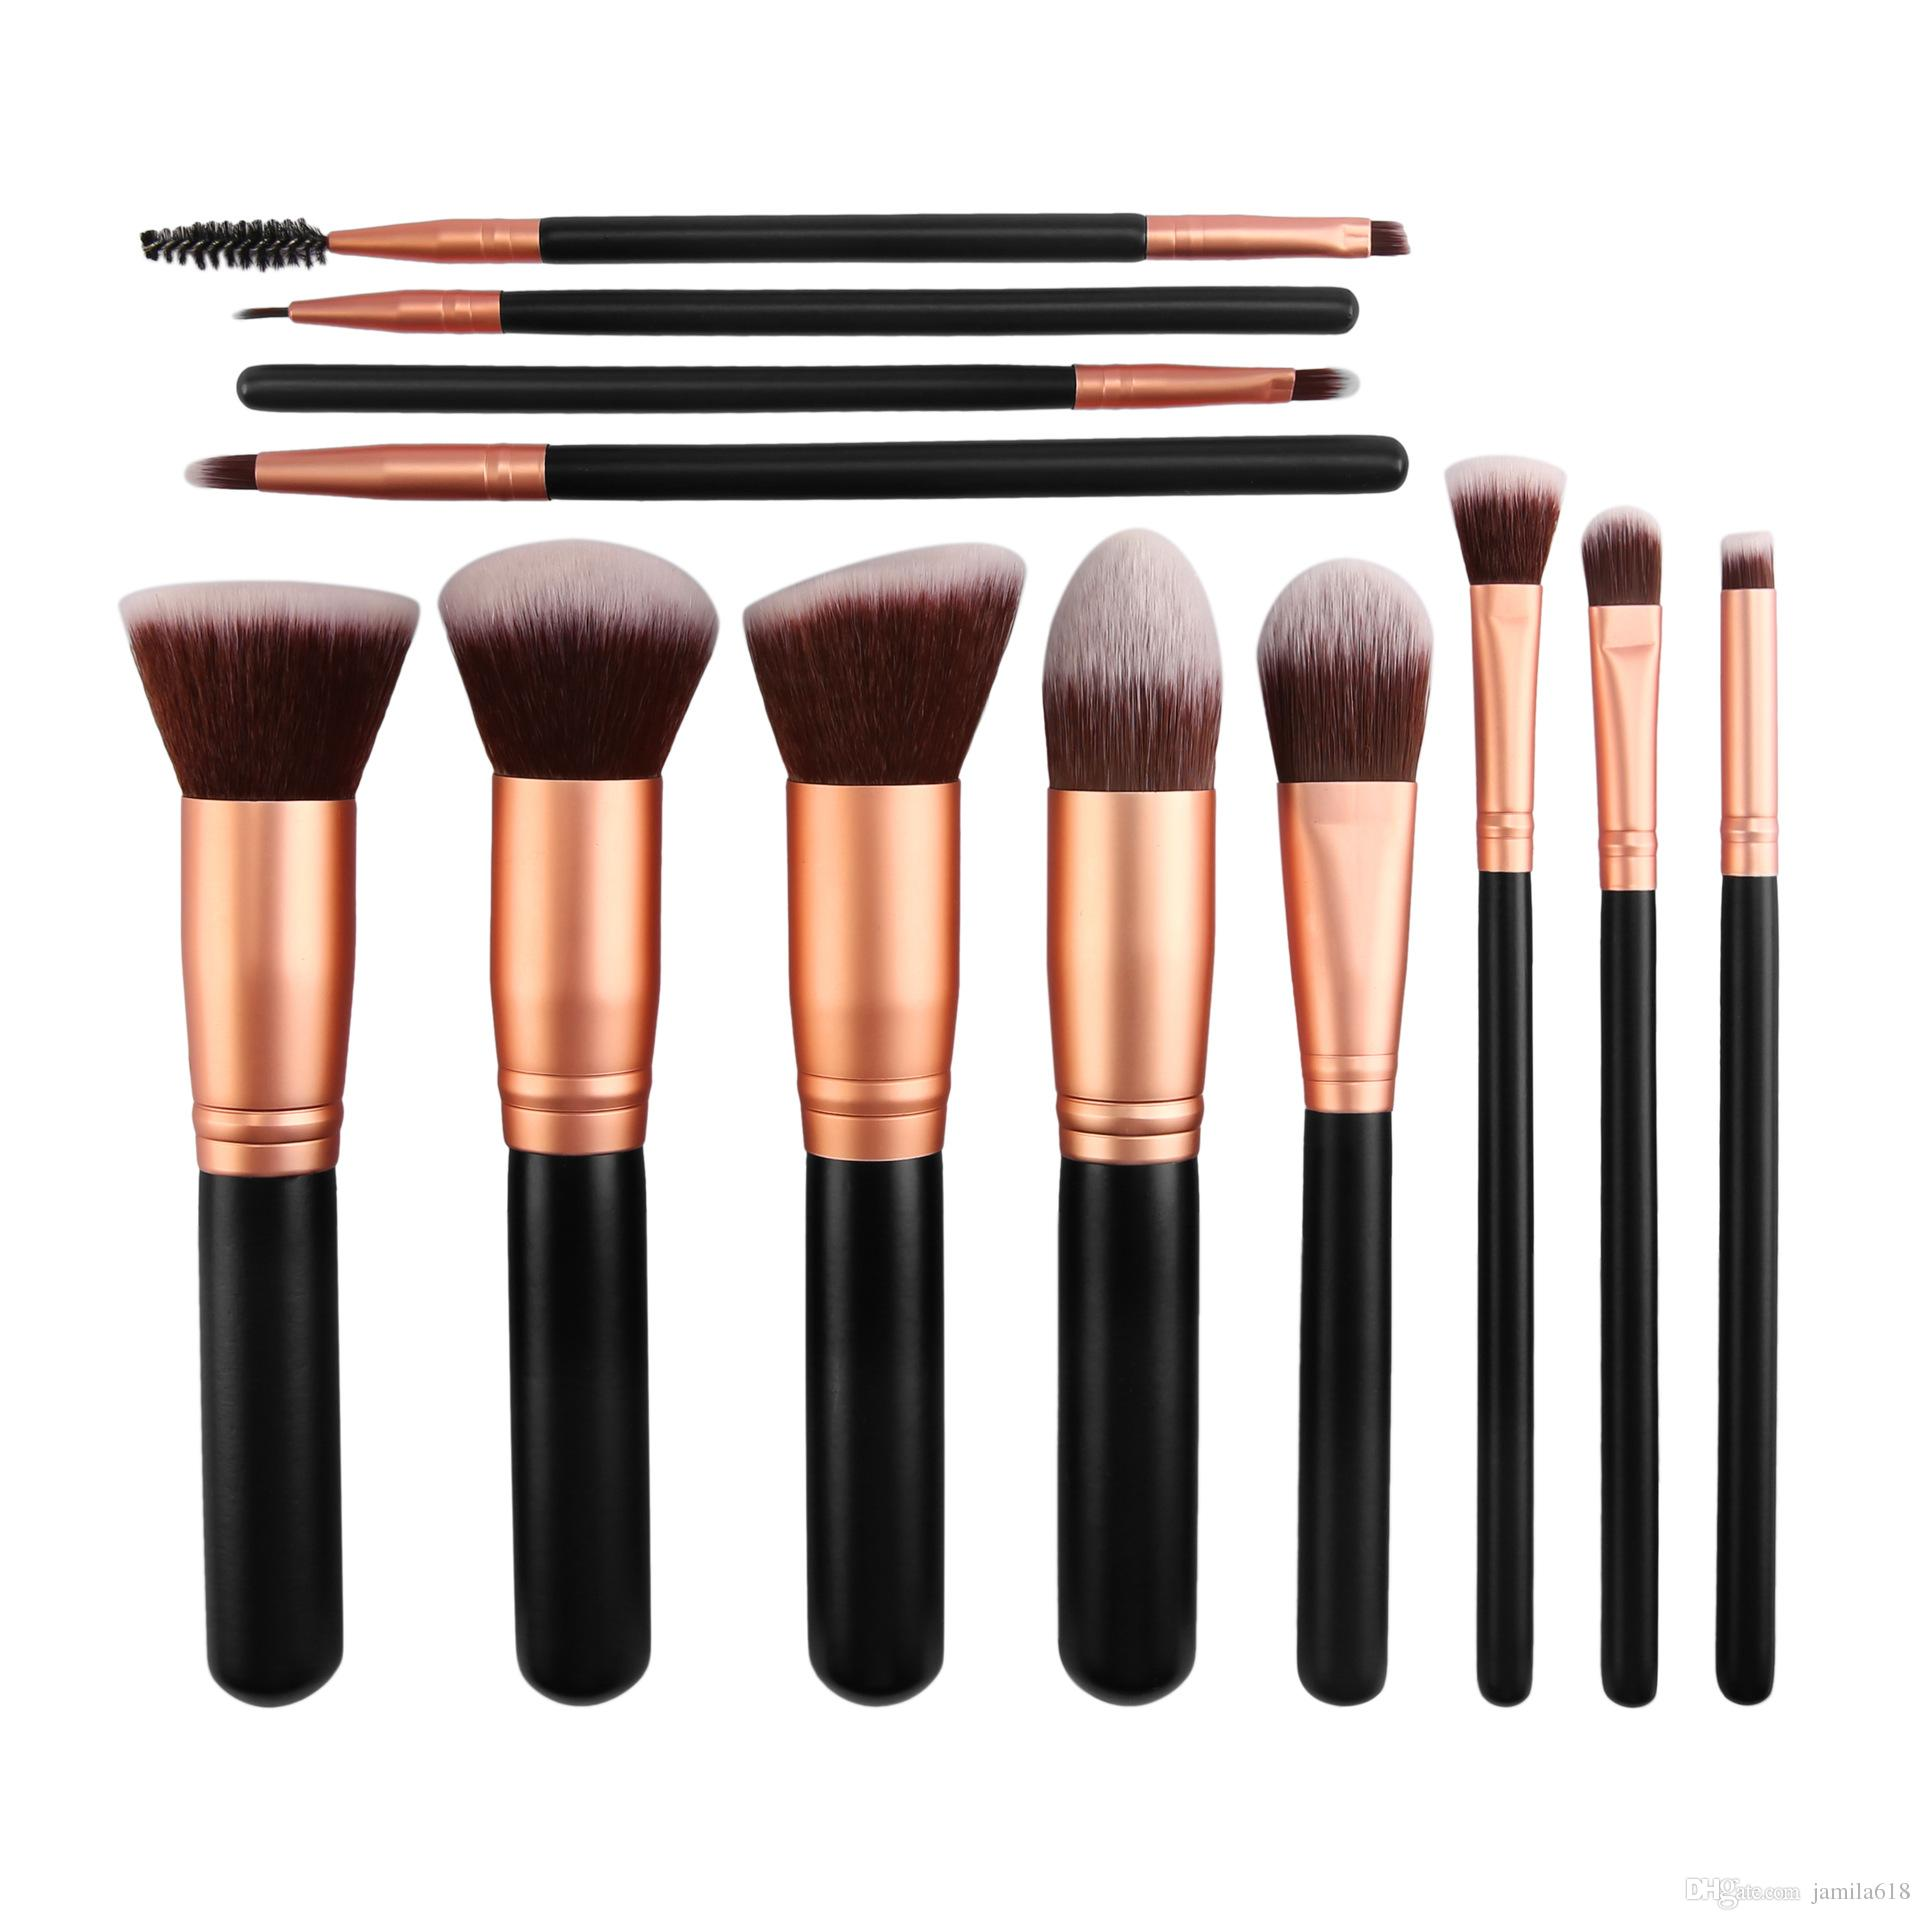 7d81b48451c7 12Pcs Multi-functional Professional Wooden Handle Makeup Brushes Set Kit  Cosmetic Foundation Blush Eye Shadow Blending Make up Brushes Tool